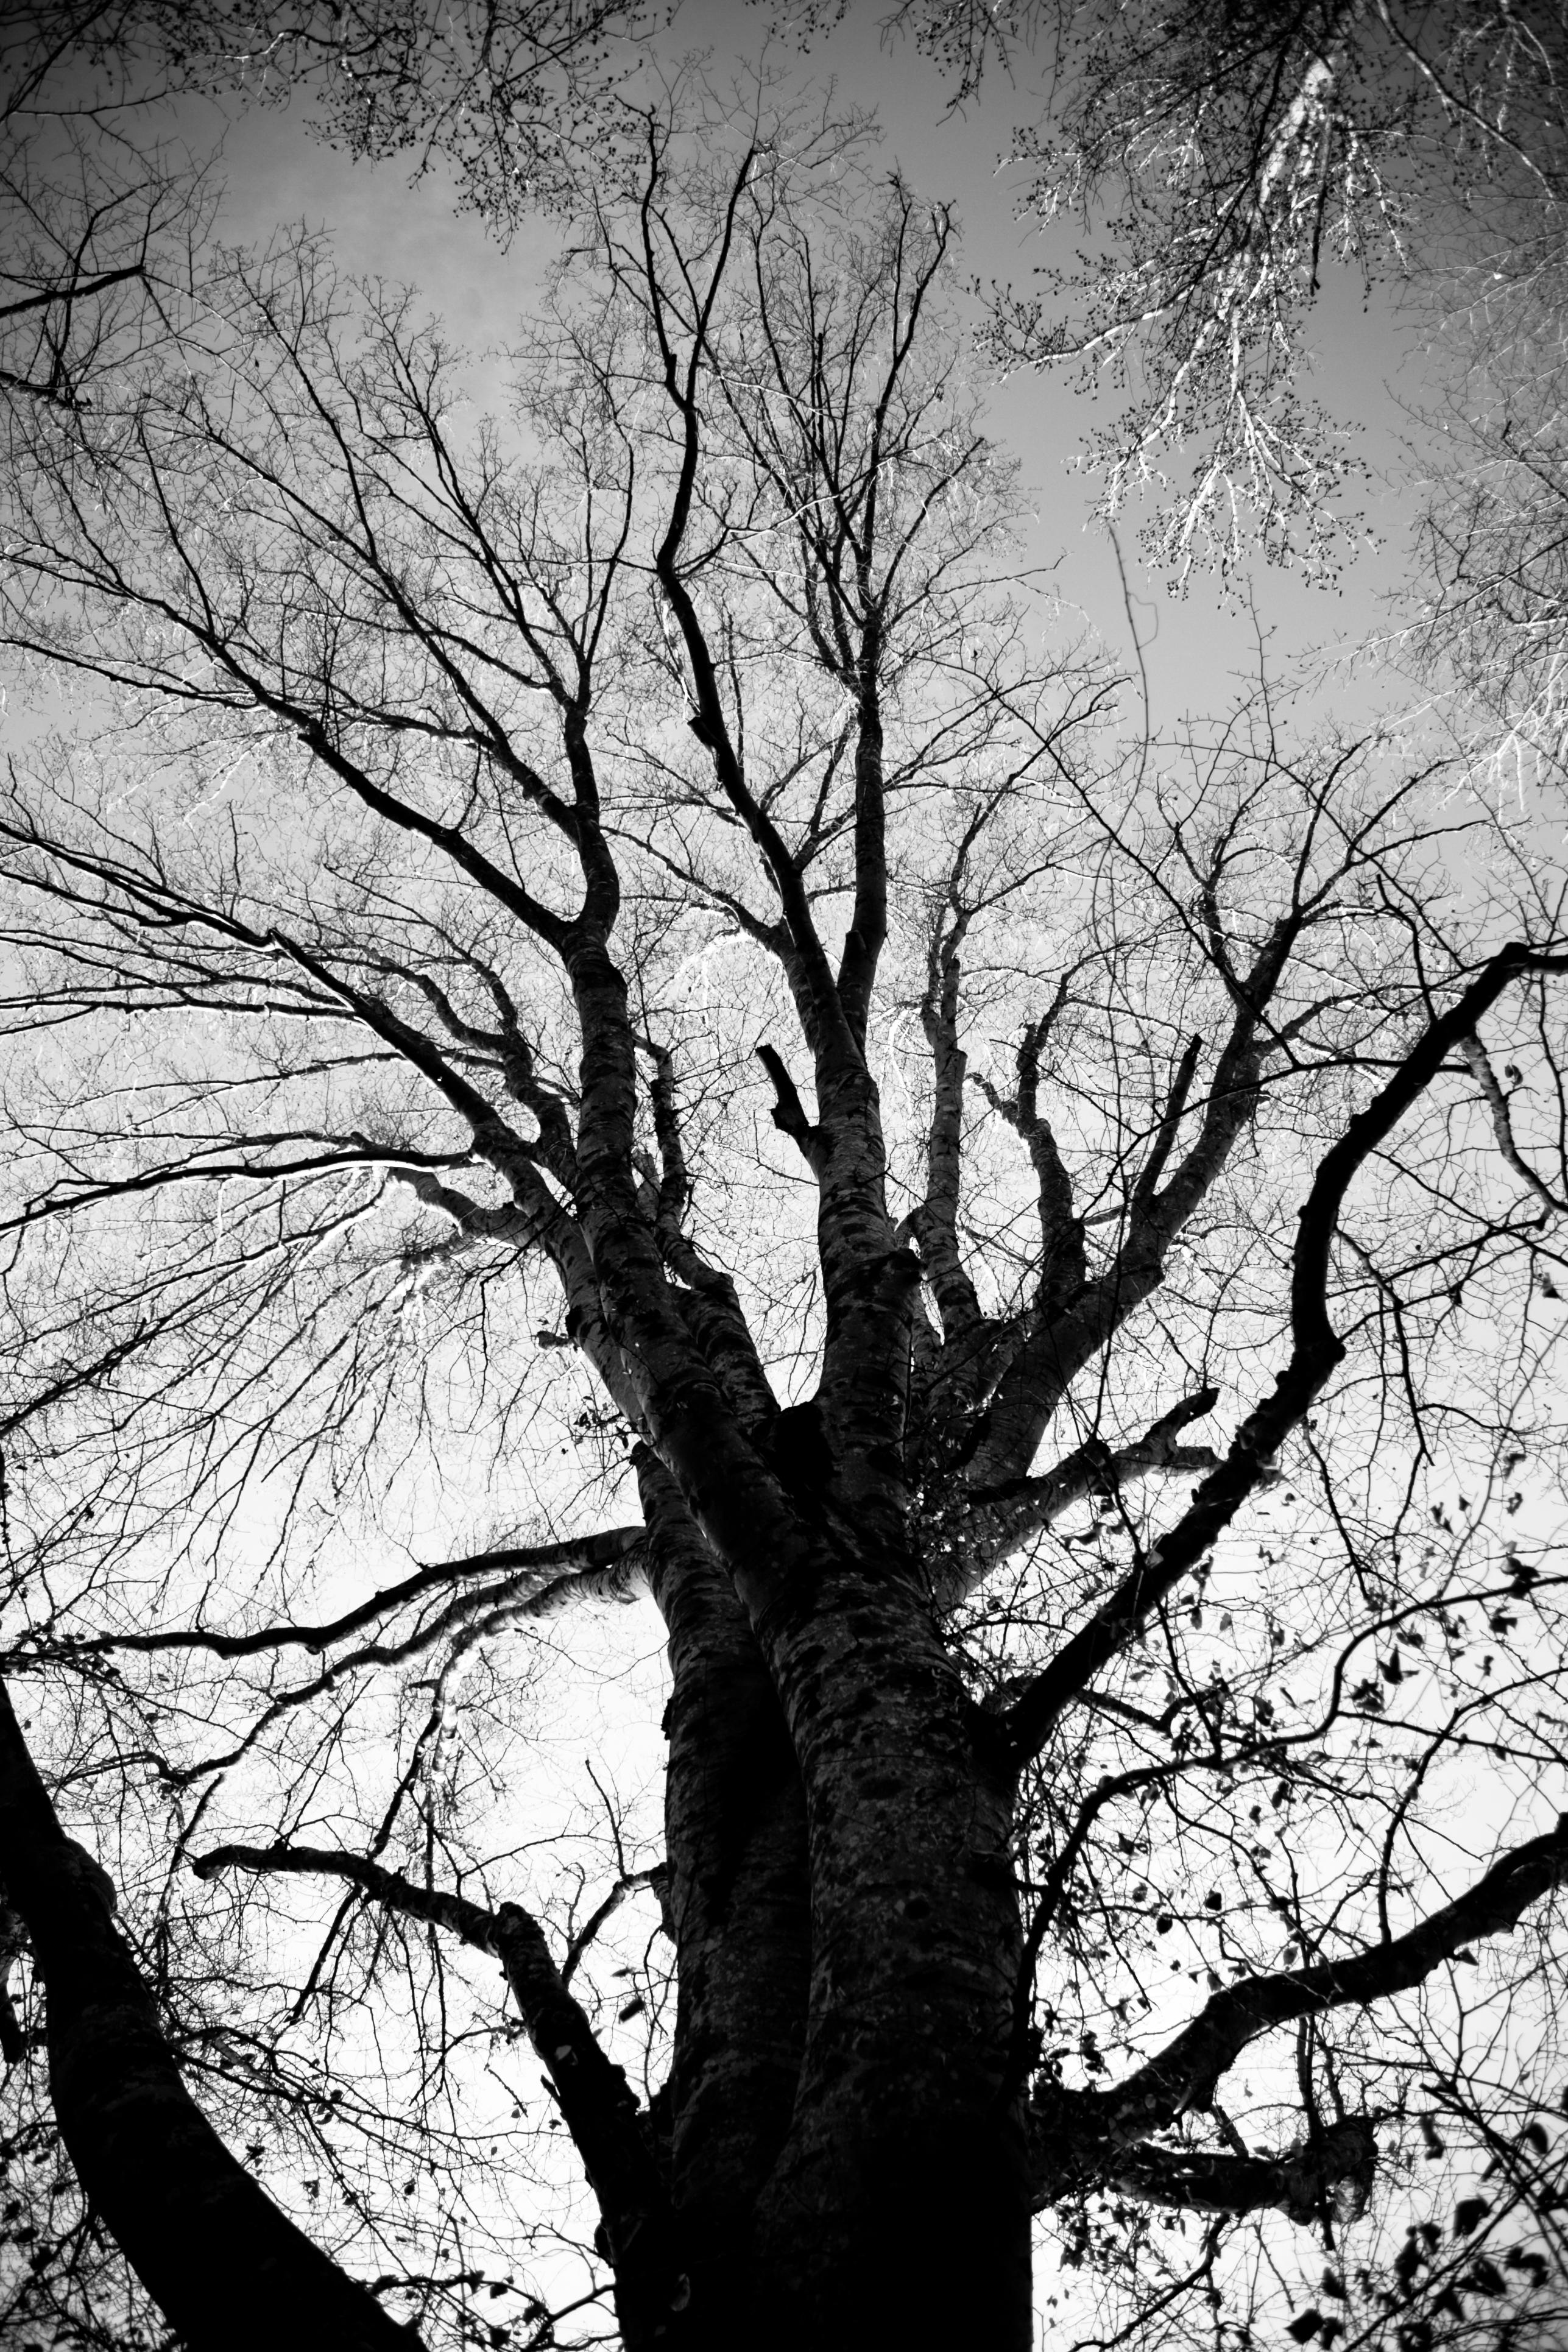 treeoflife-0318